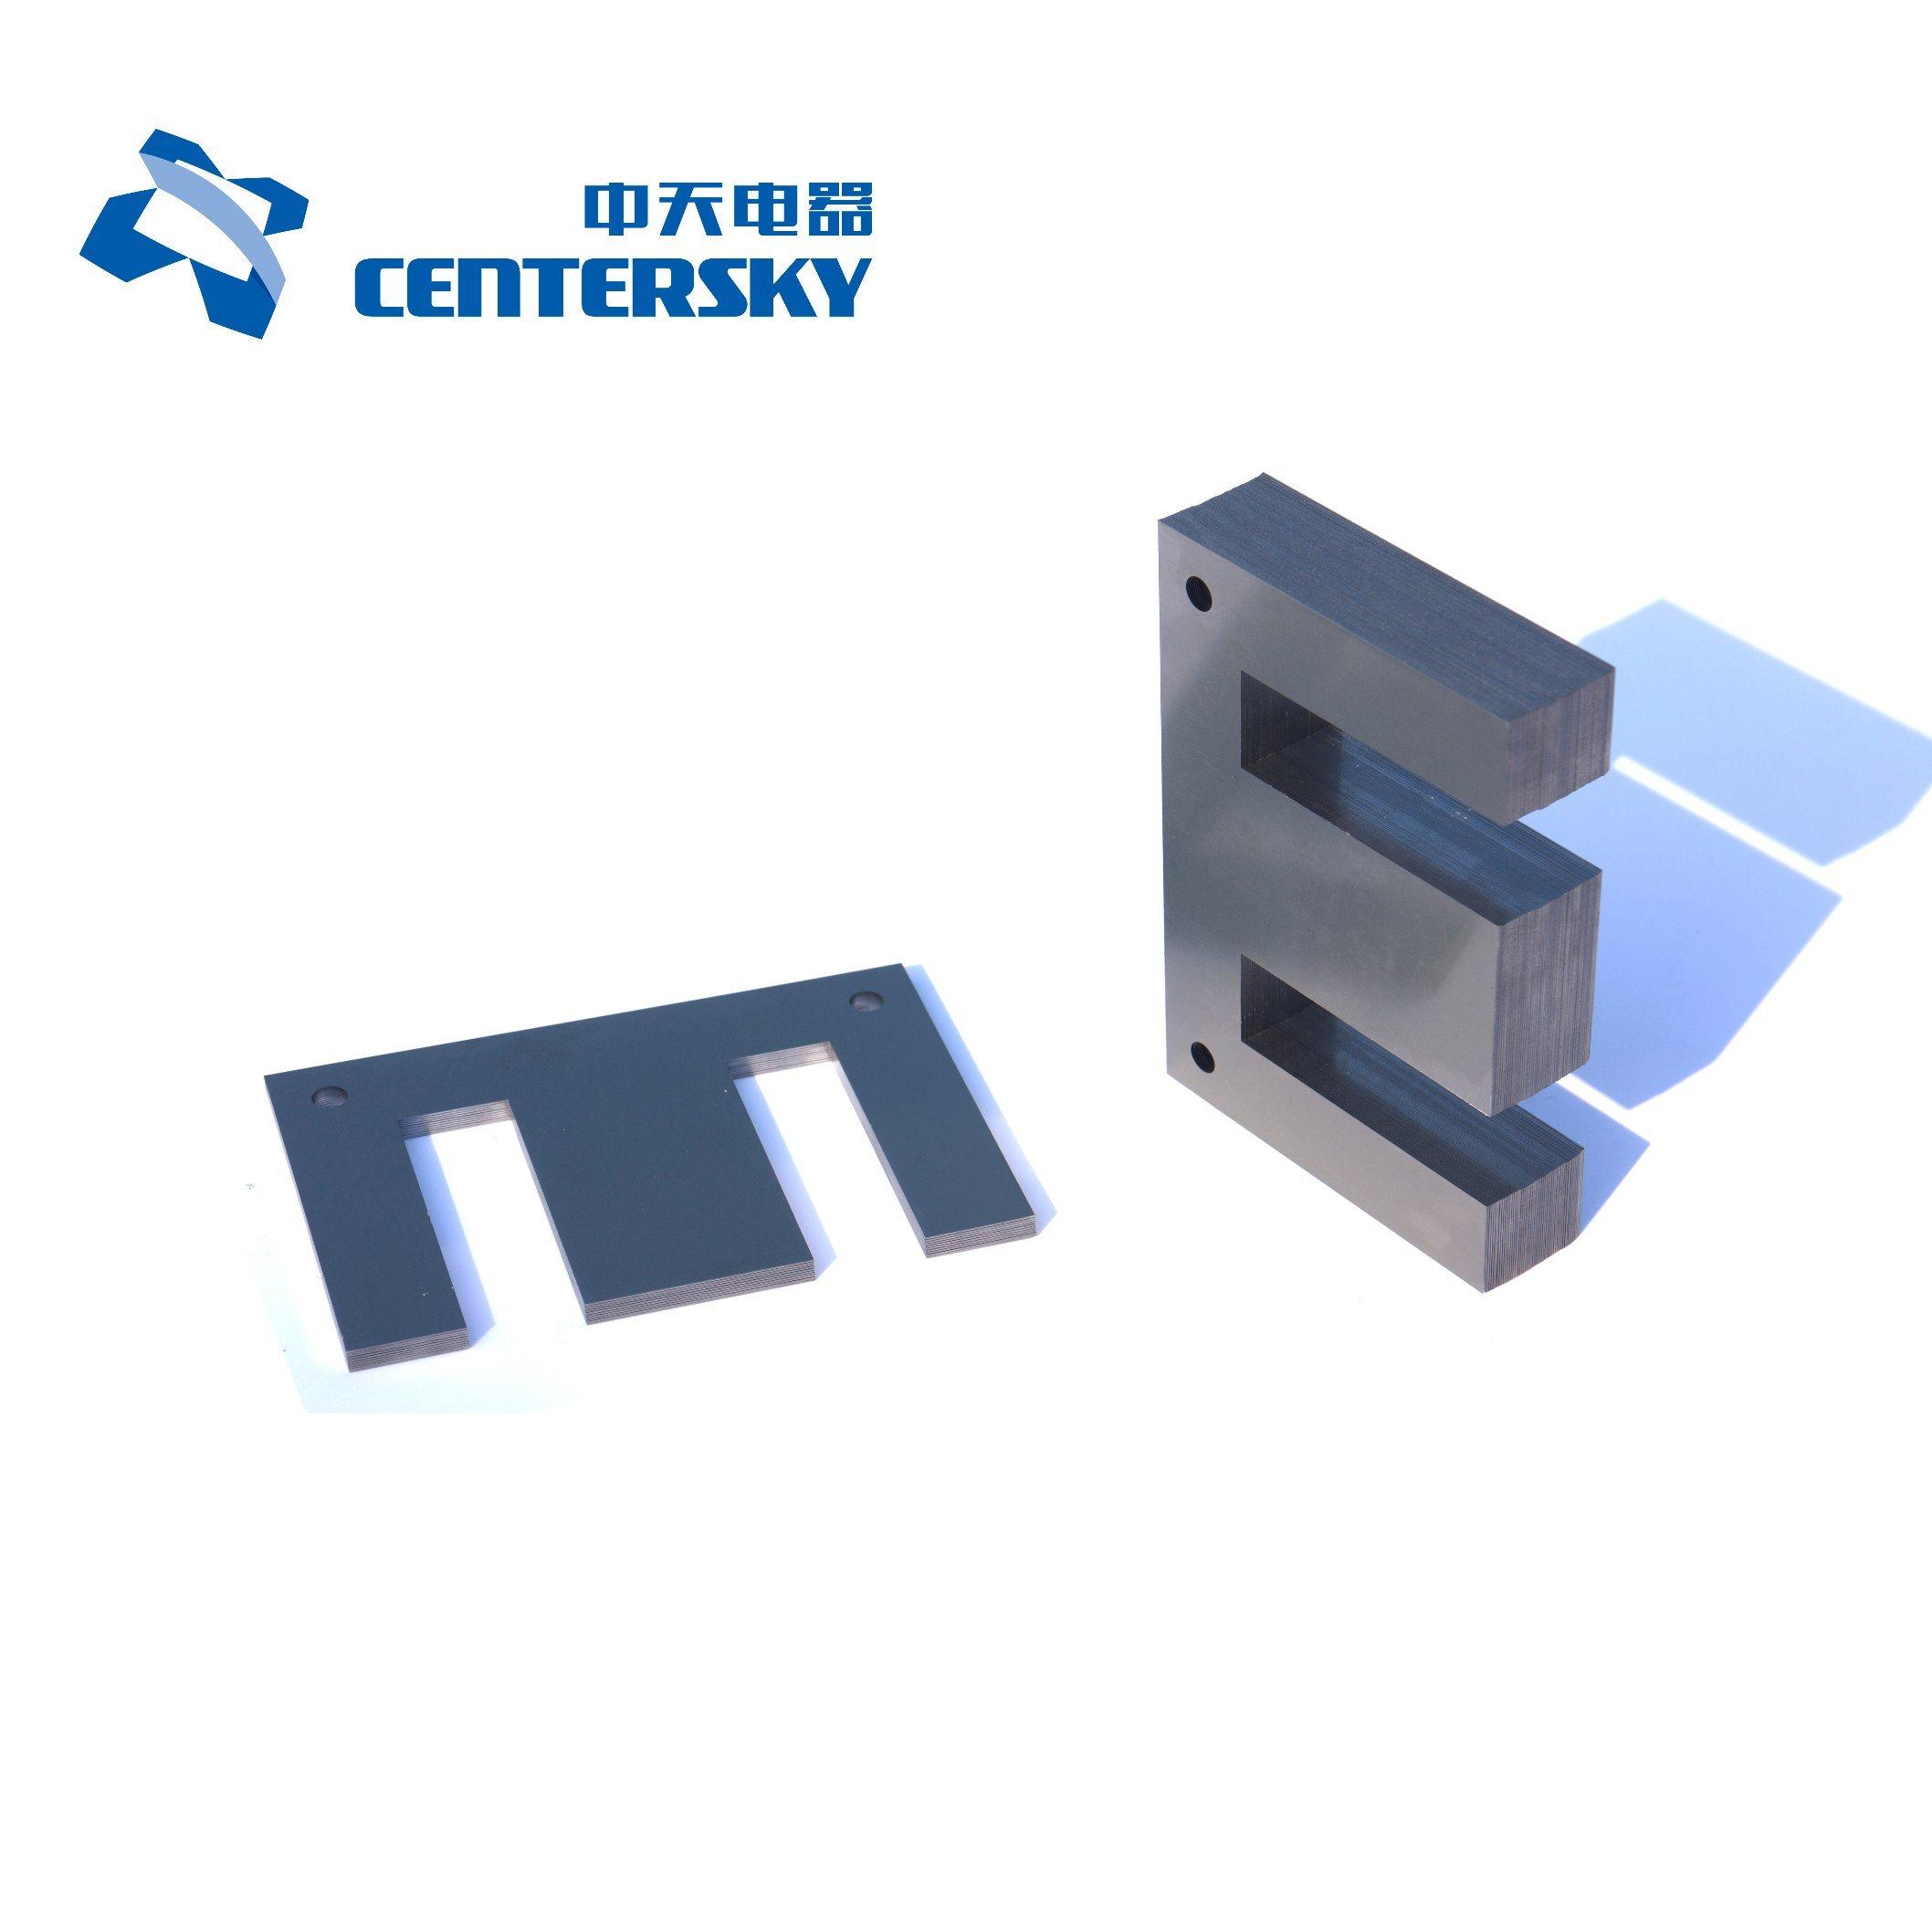 CRGO Ei Silicon Steel Lamination for Transformer Made in China